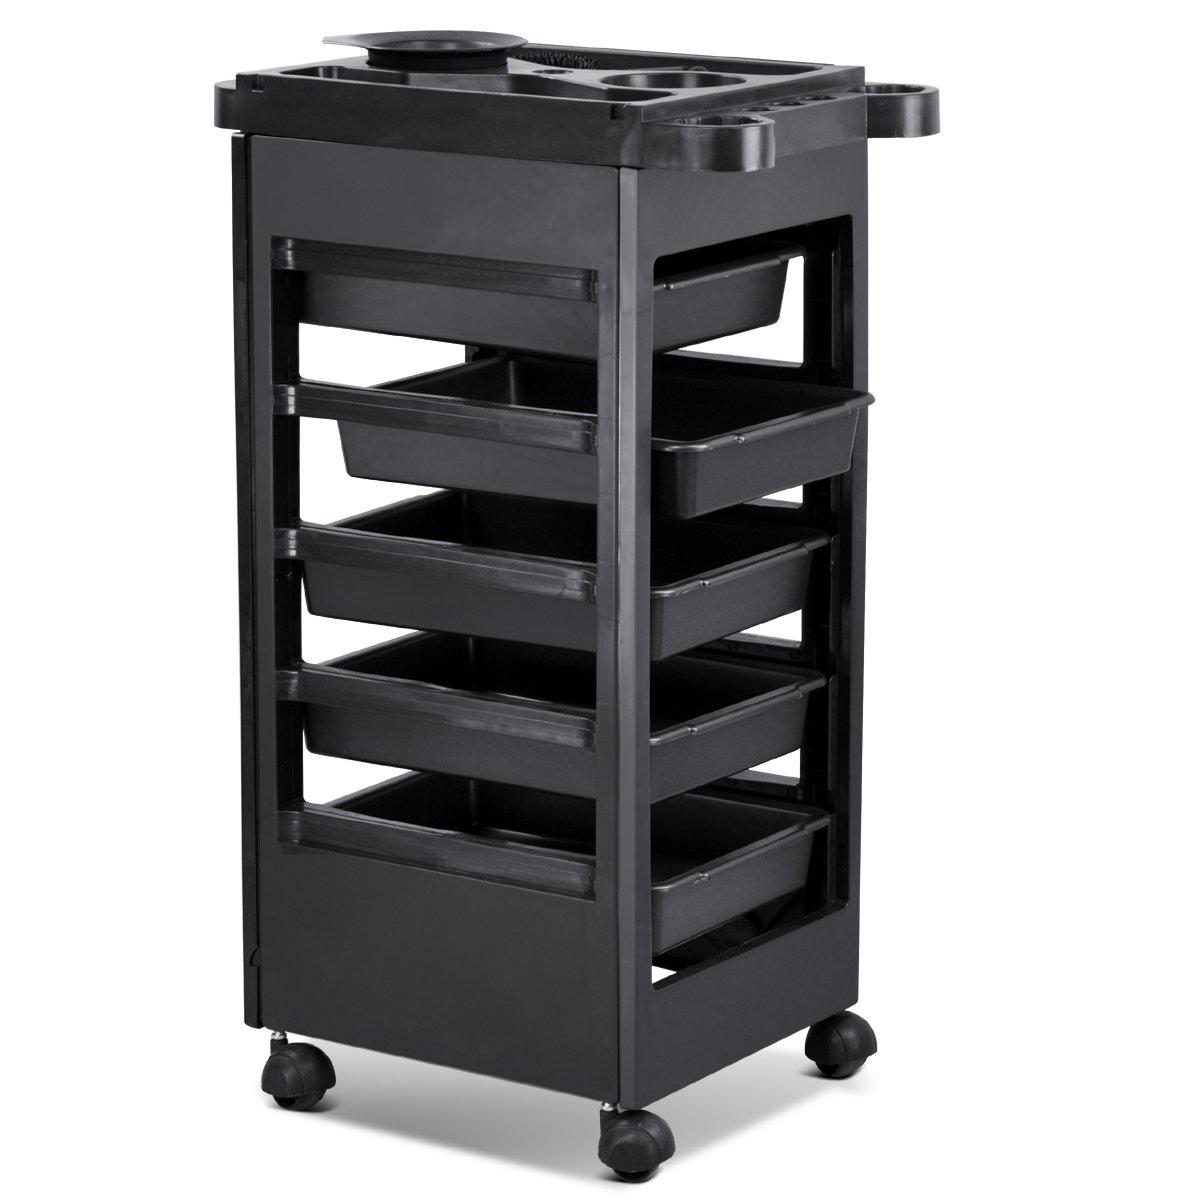 Hair Salon Rolling Trolley Storage Cart w/ 5-Drawer Workstation by Generic 12TRL001-5D1T-06